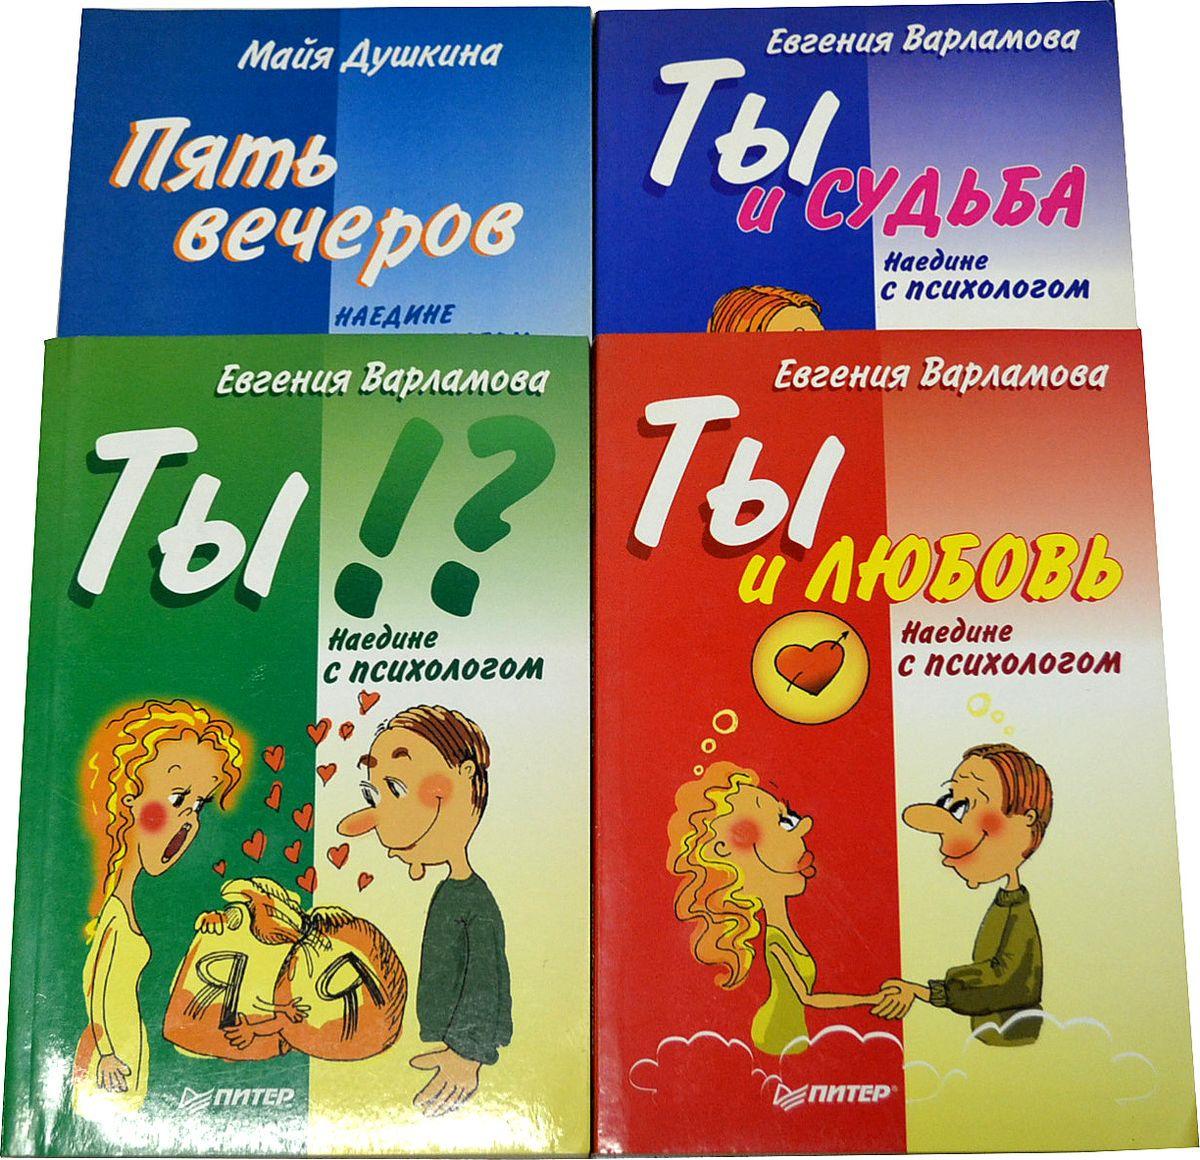 Варламова Е.,Душкина М. Серия